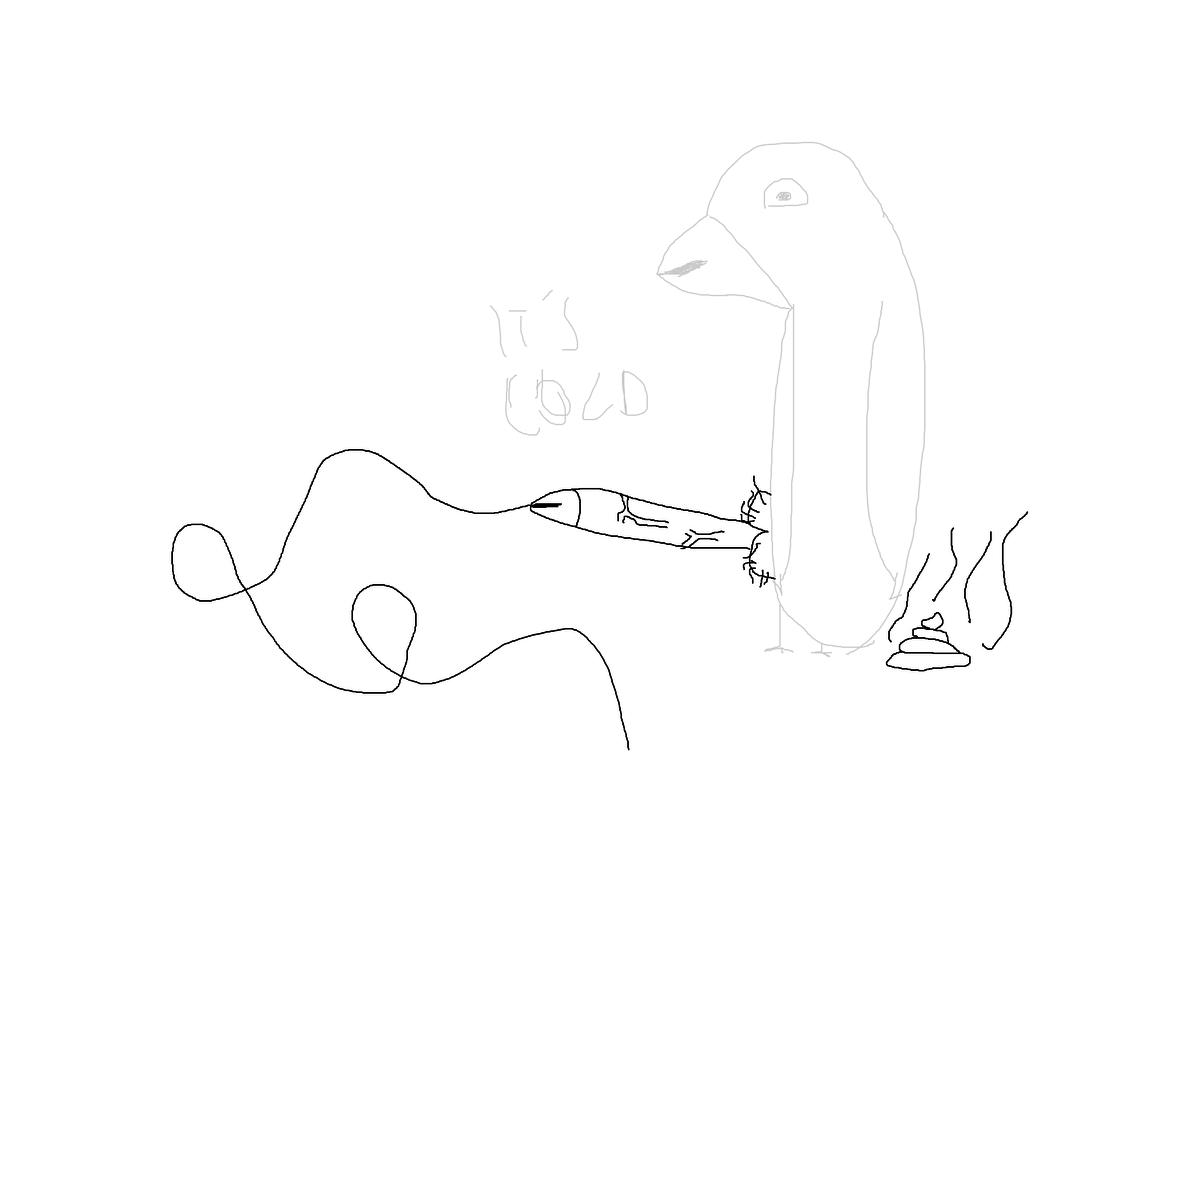 BAAAM drawing#23015 lat:-70.9552001953125000lng: 5.6458506584167480